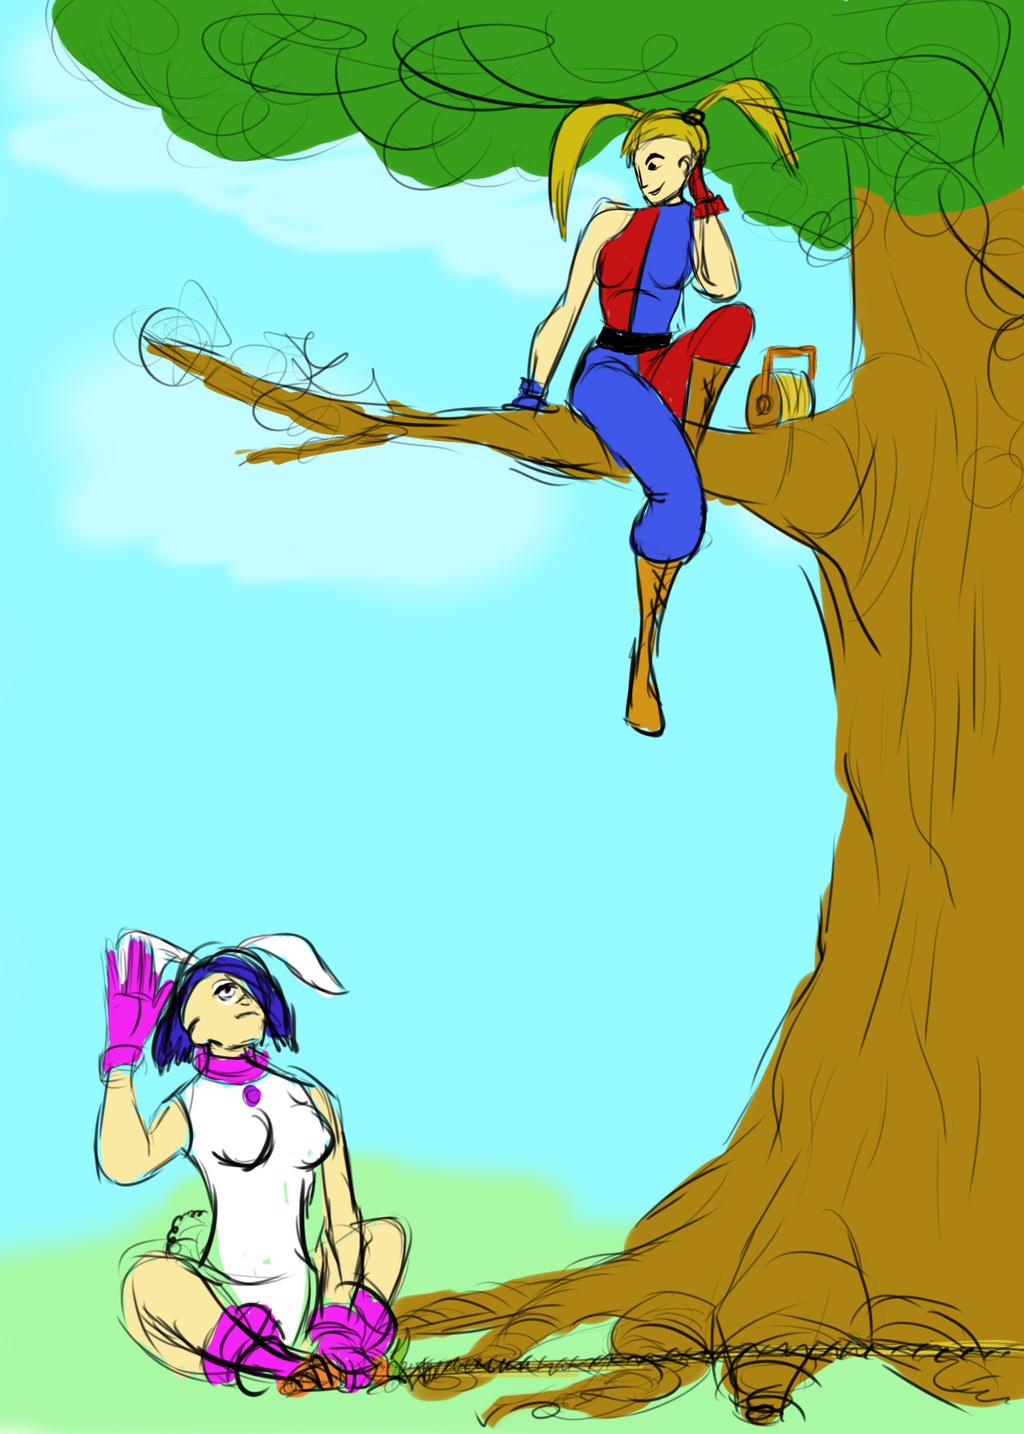 Harley Quinn meets White Rabbit by JMK-Prime